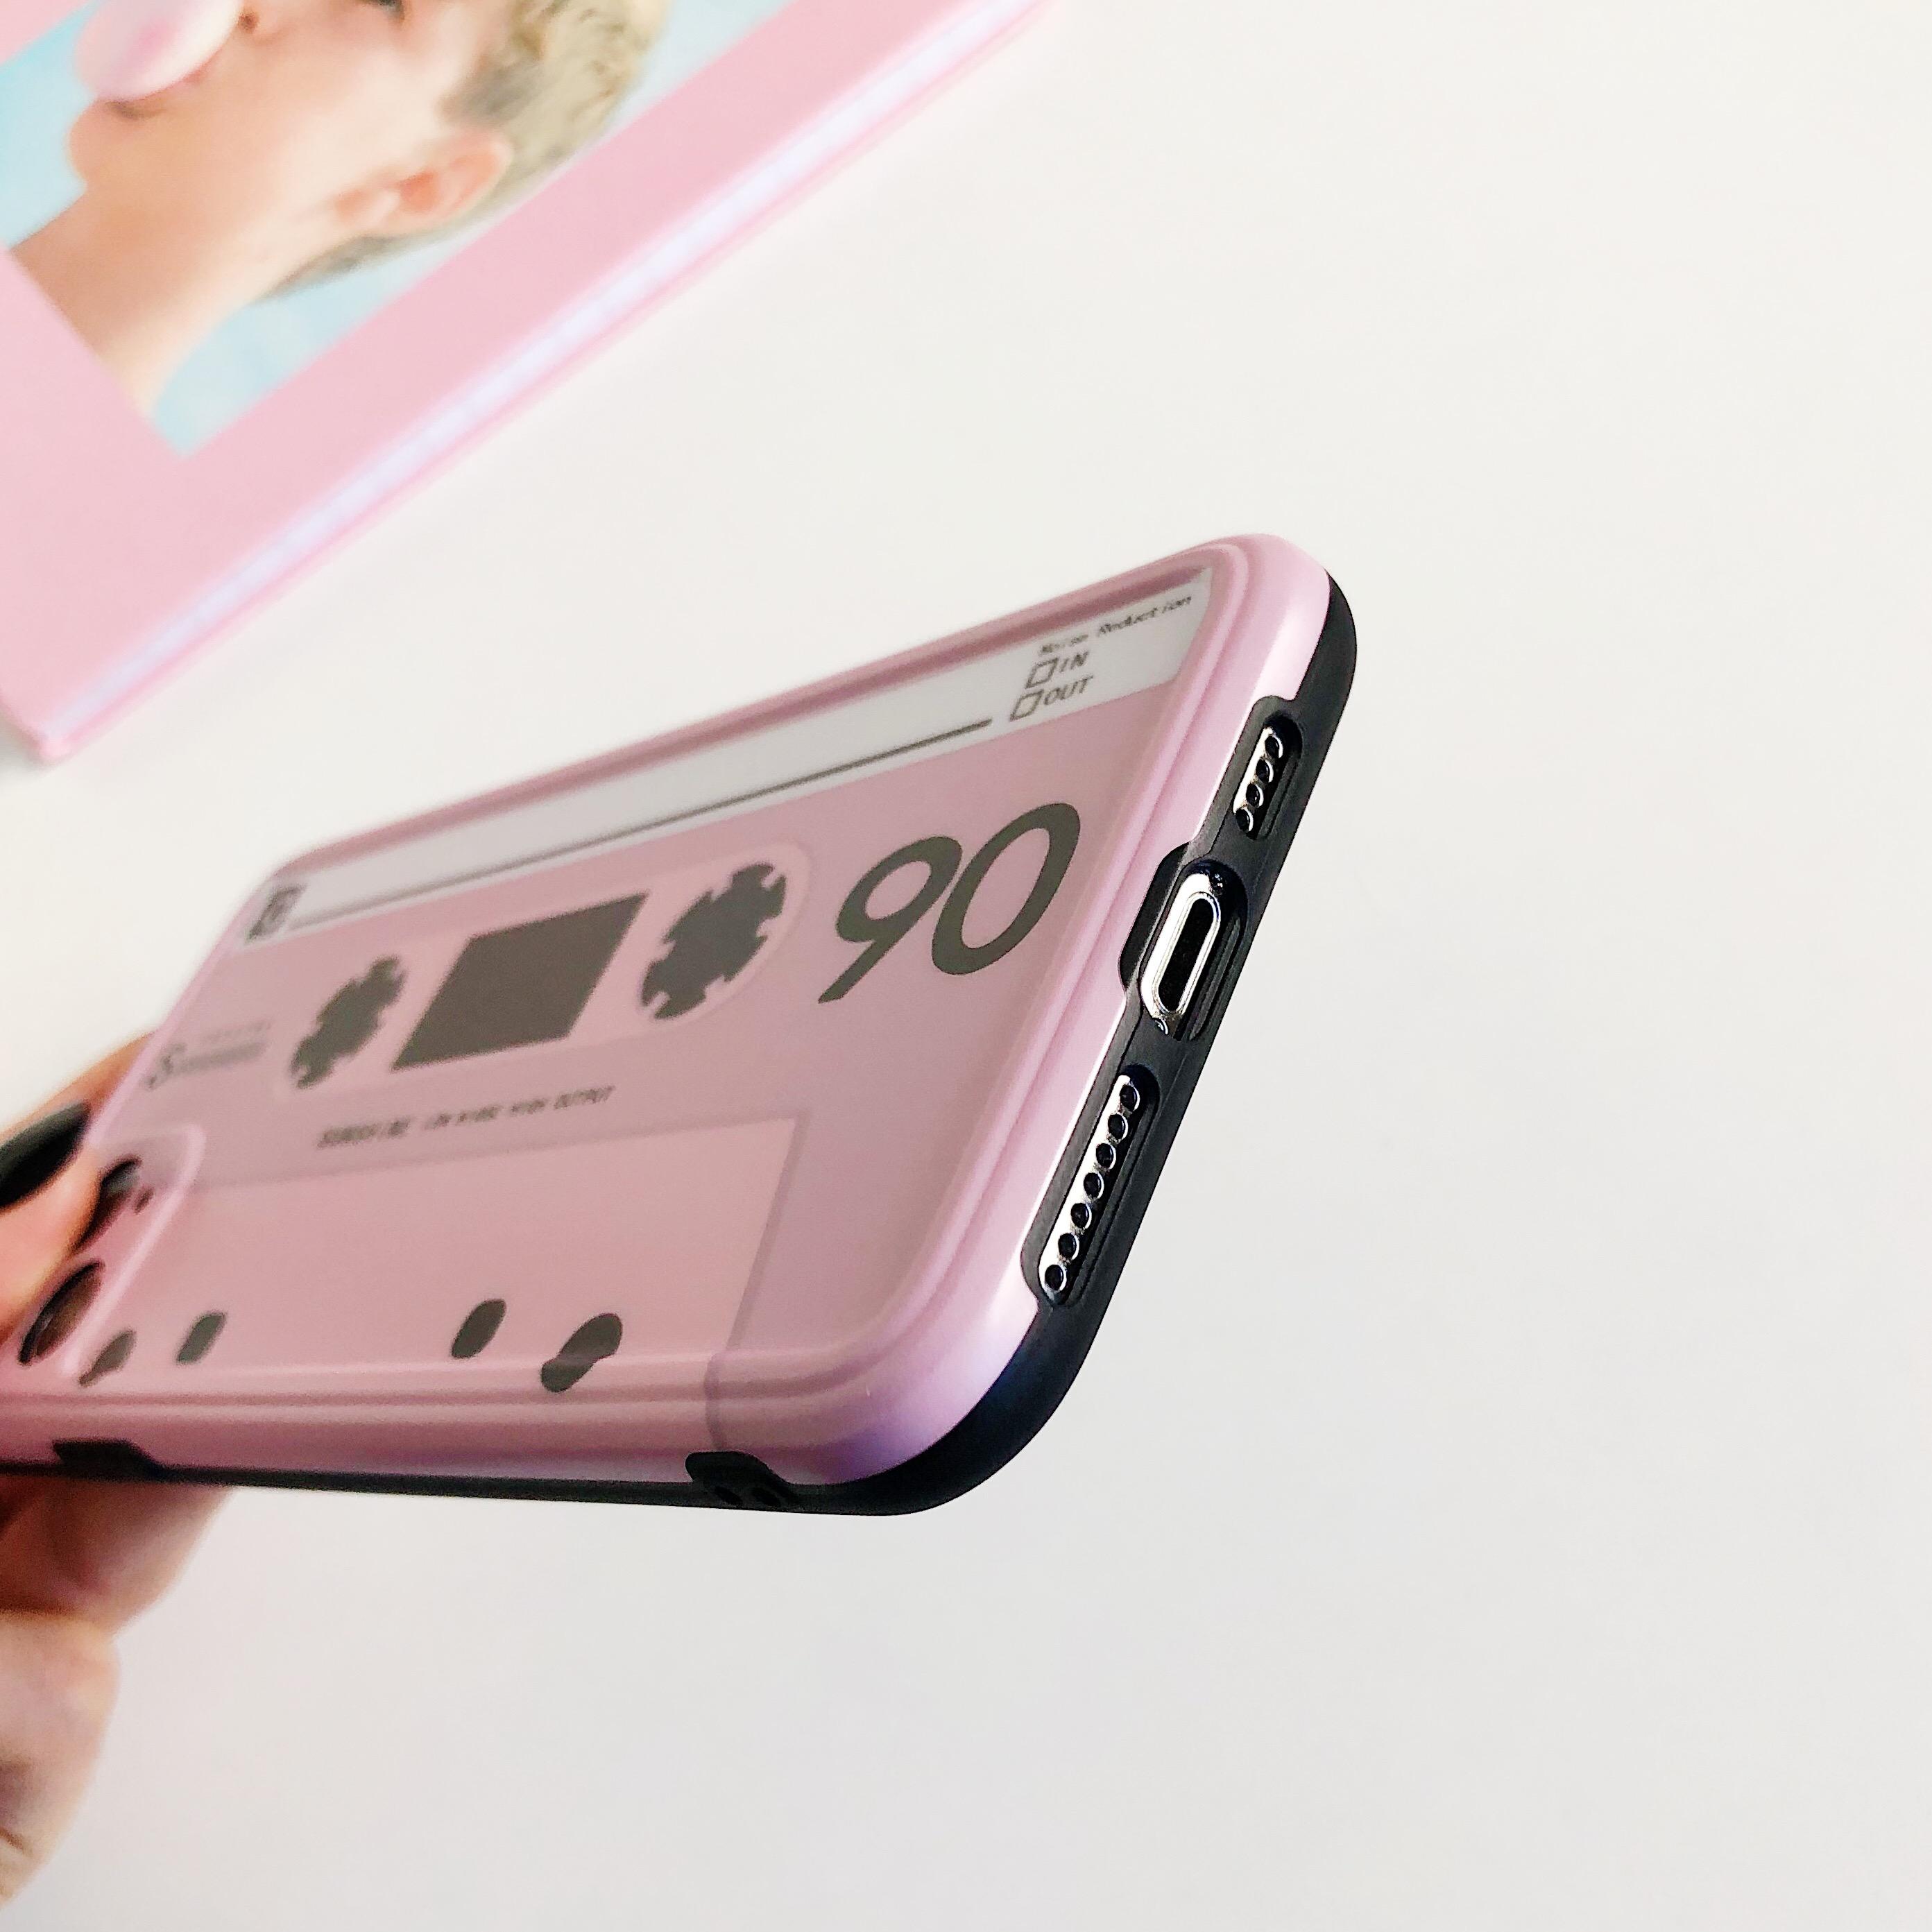 Tongkun Jungu iPhone 11 Pro Max iPhone XS iPhone XR iPhone 8 Tape Case